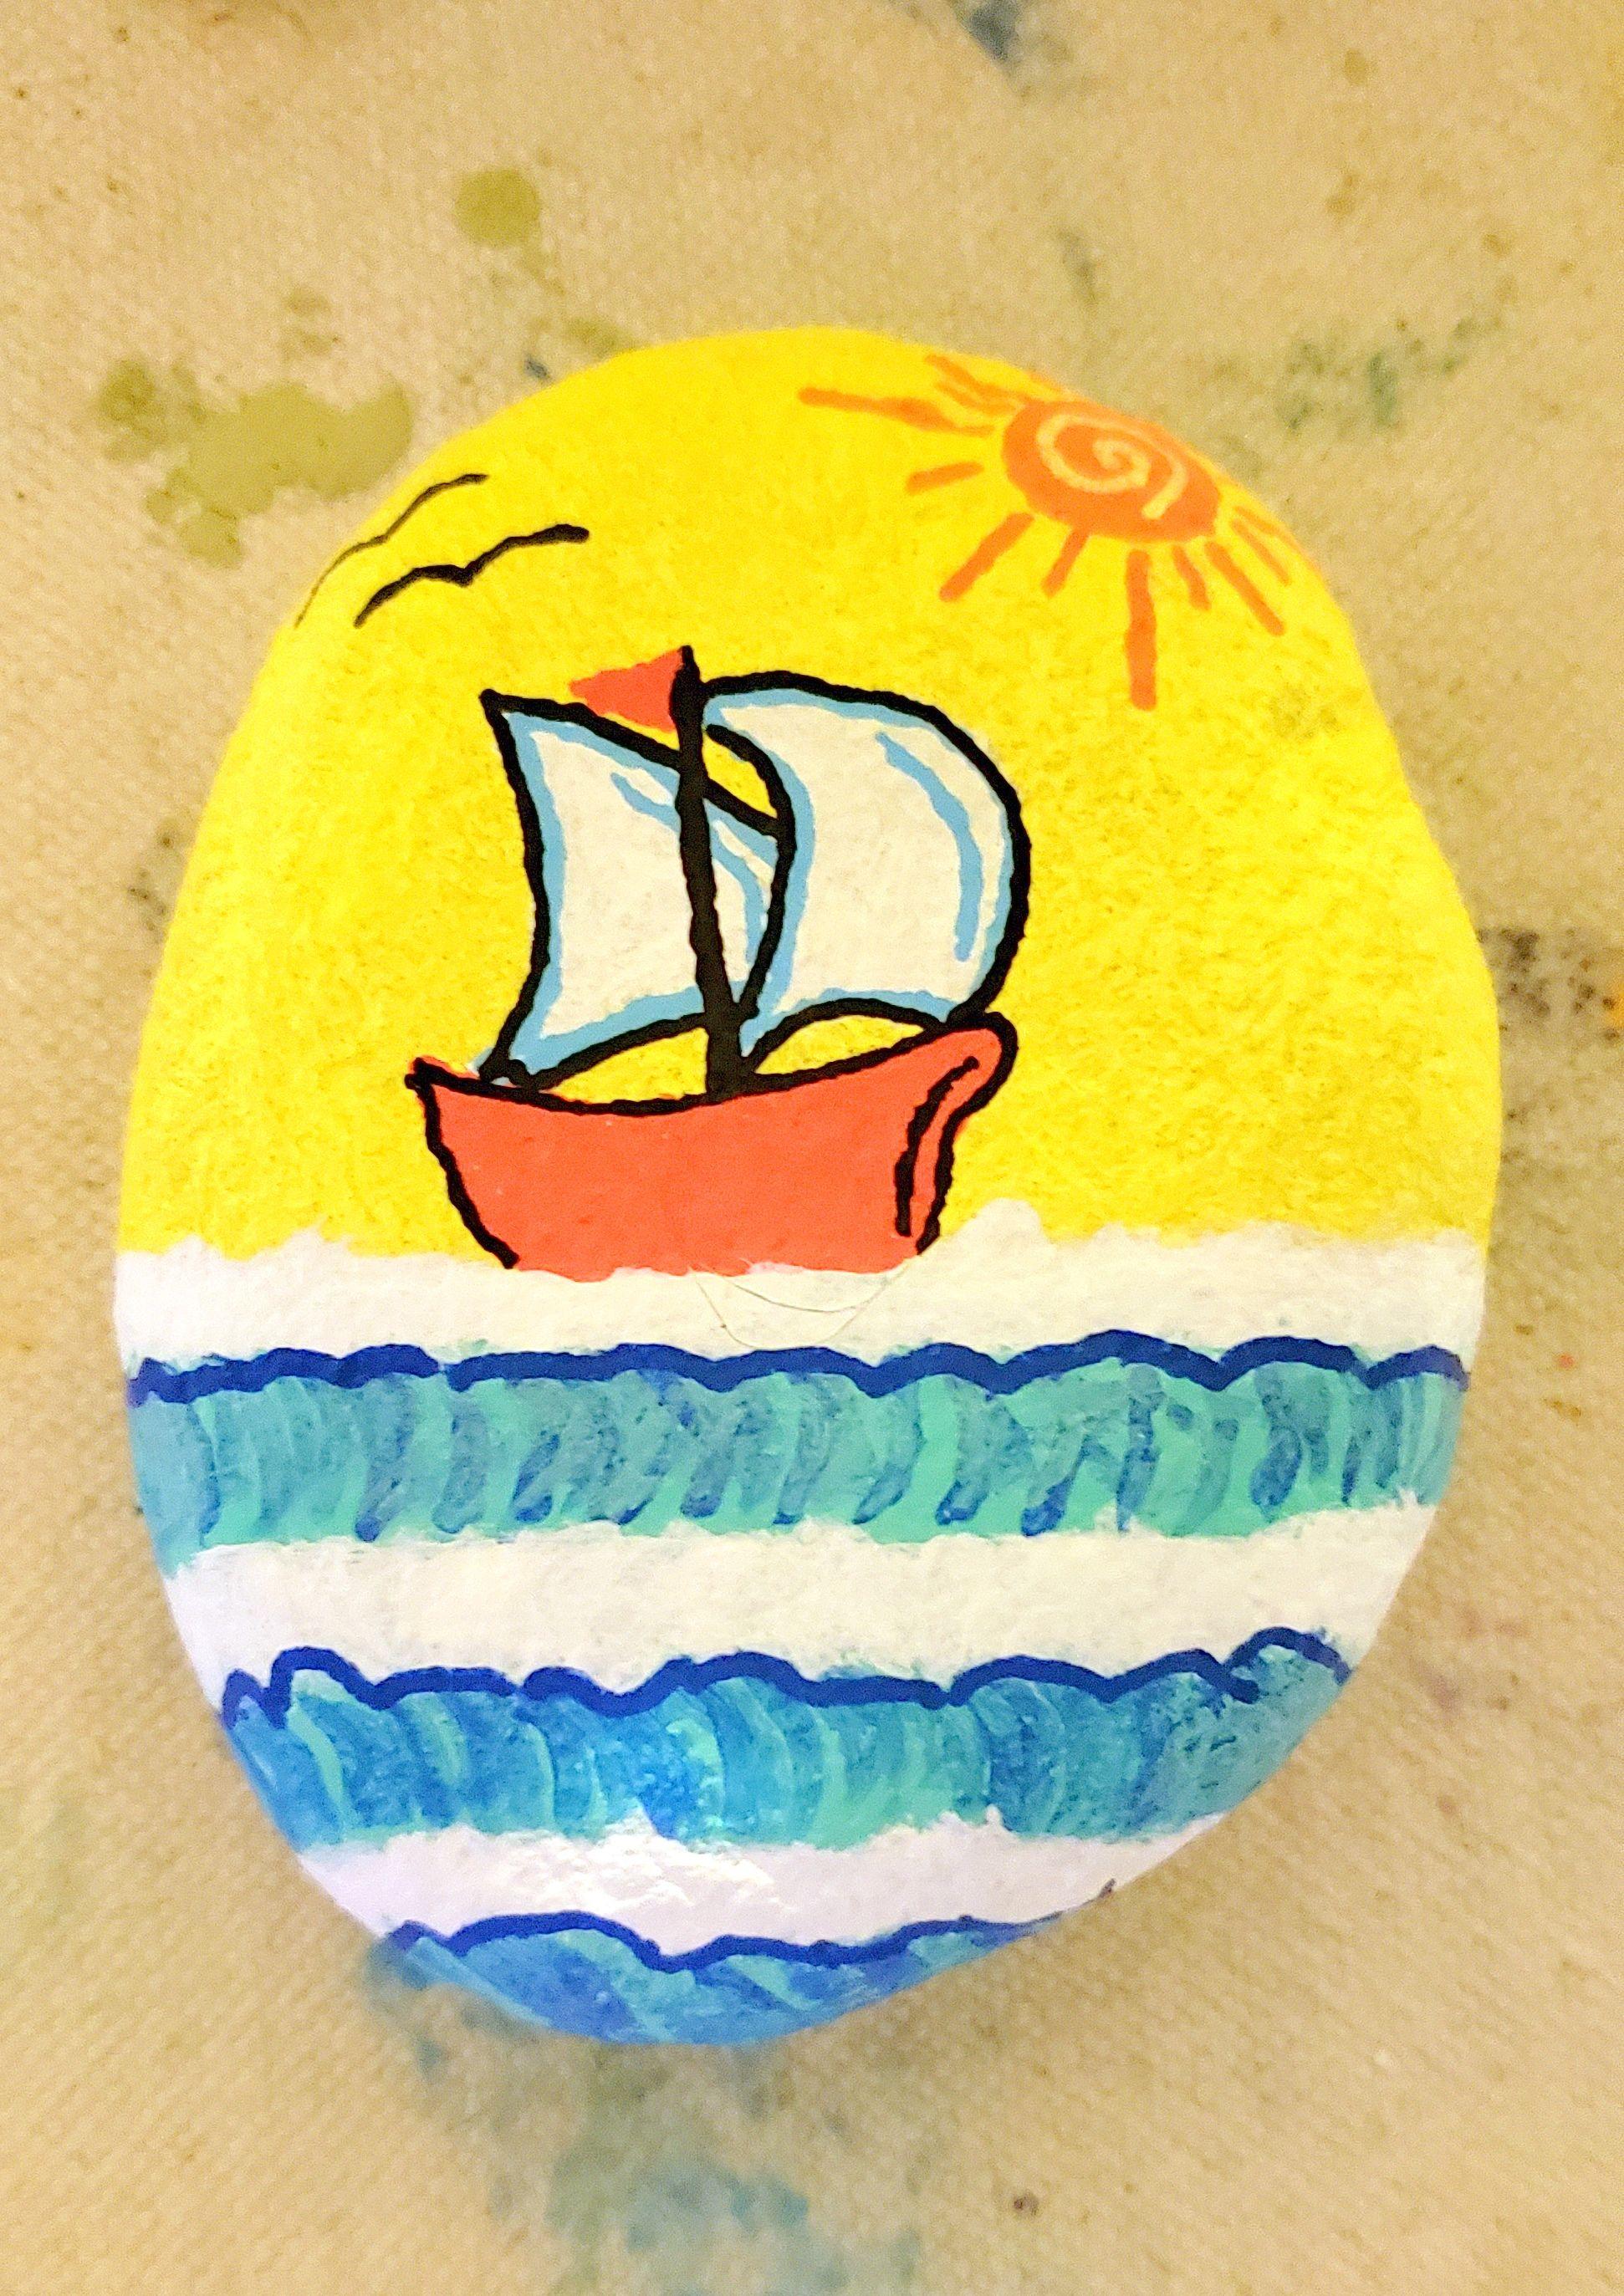 Painted Rock, Sailboat, Schooner, Ocean, Waves, Sunshine ...